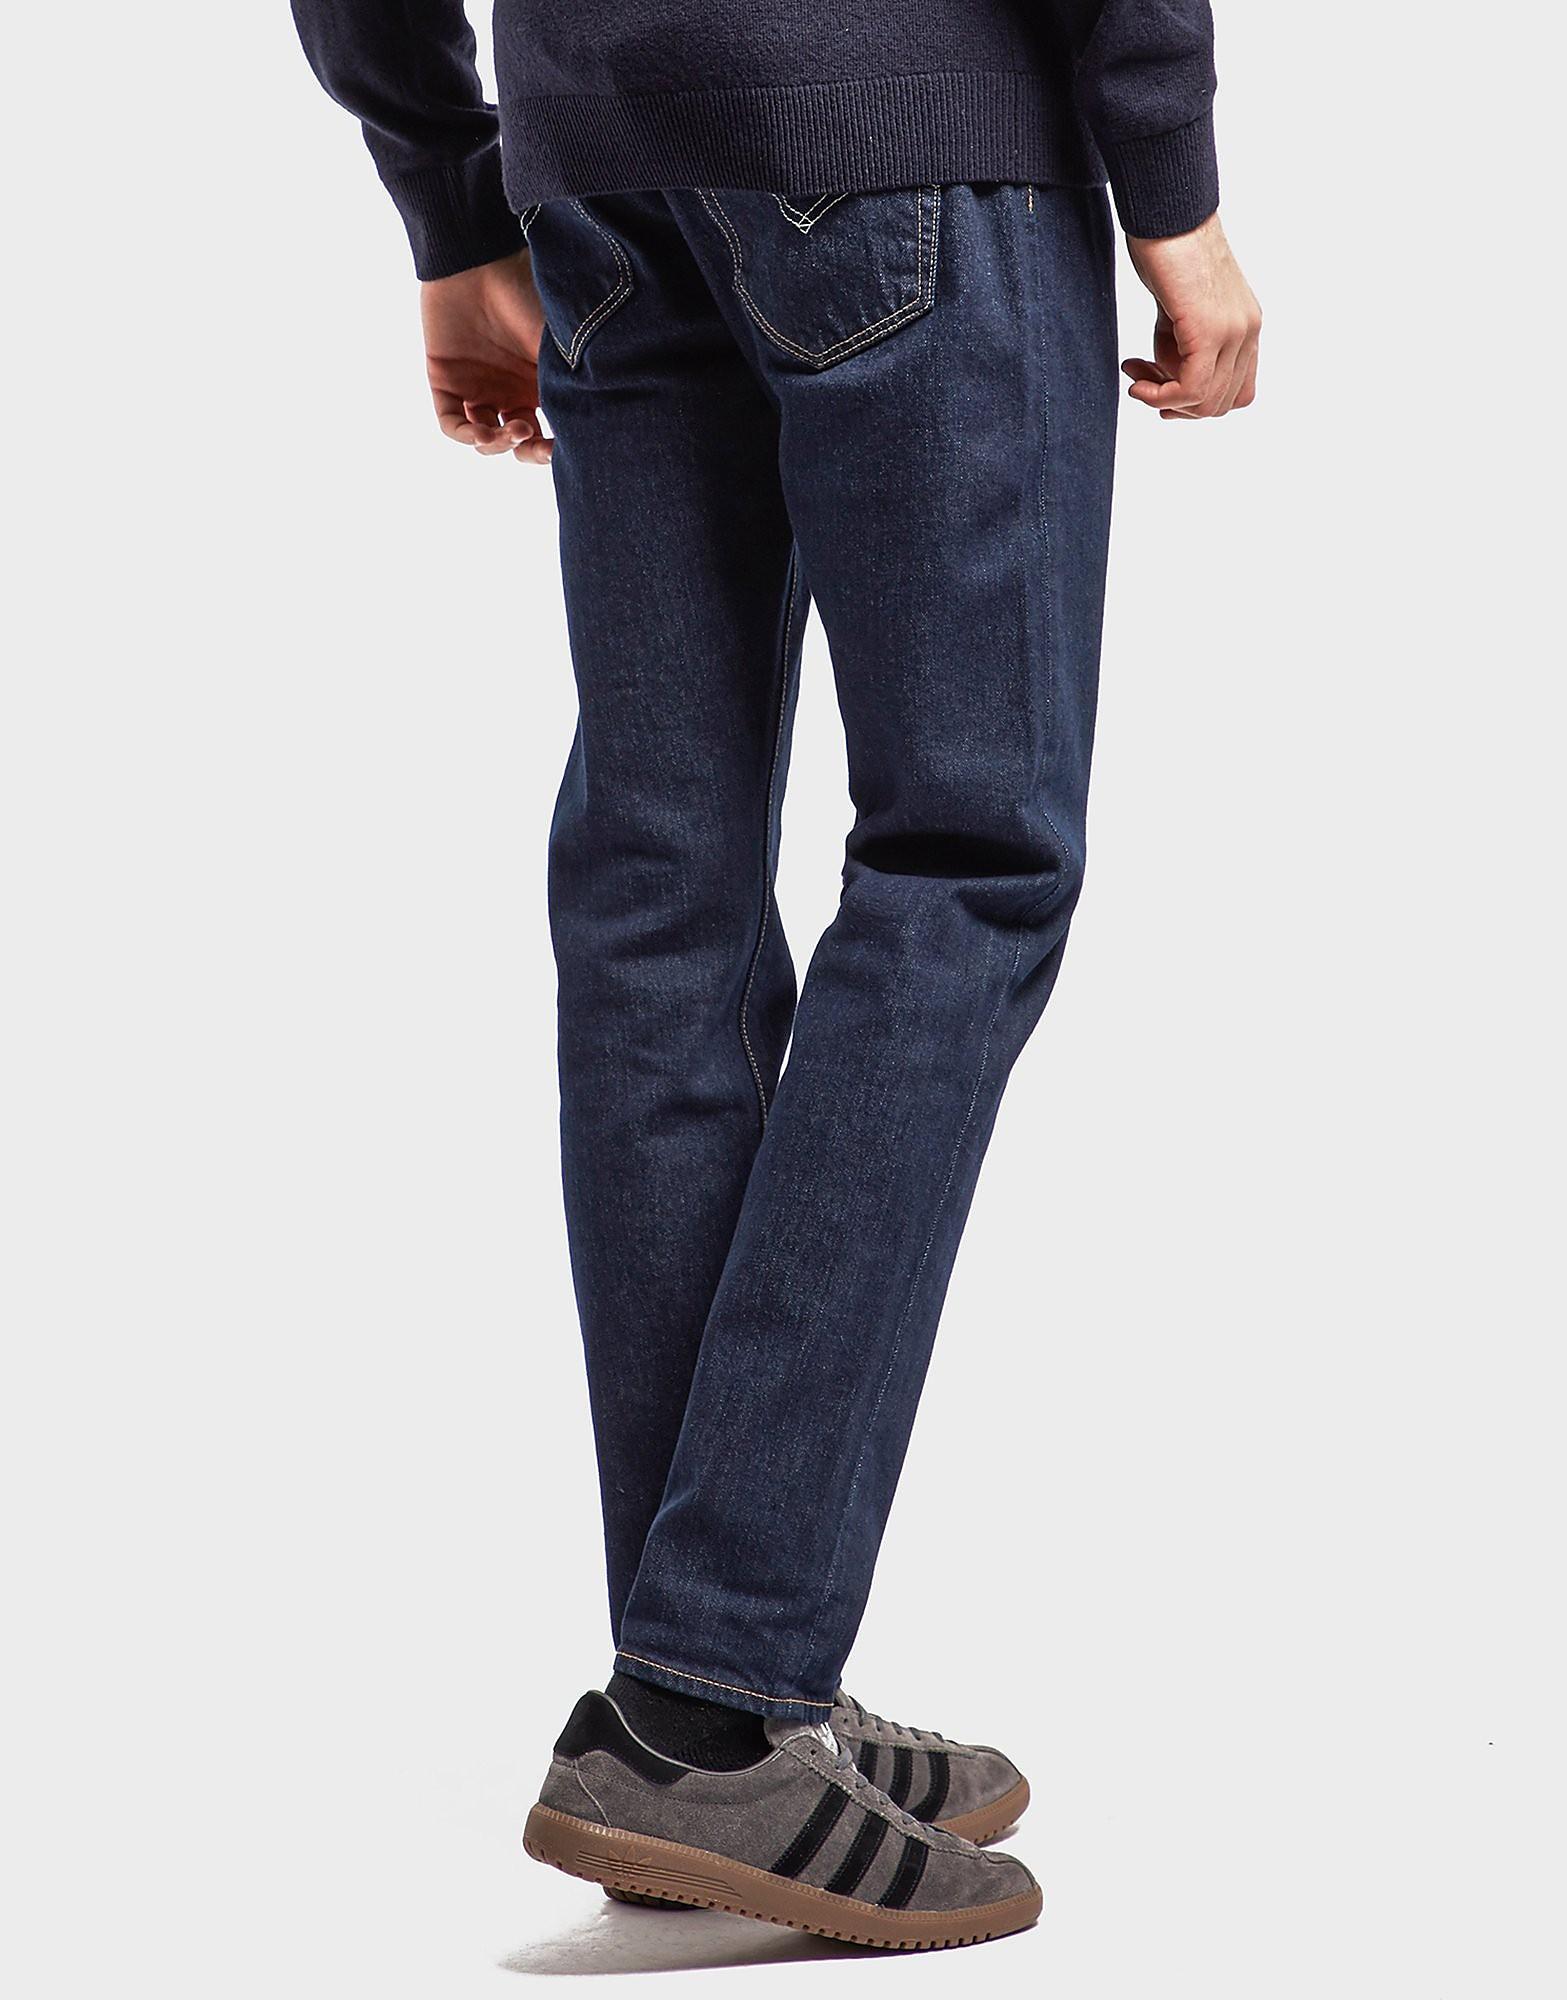 Levis 512 Taper Chainrinse Jeans